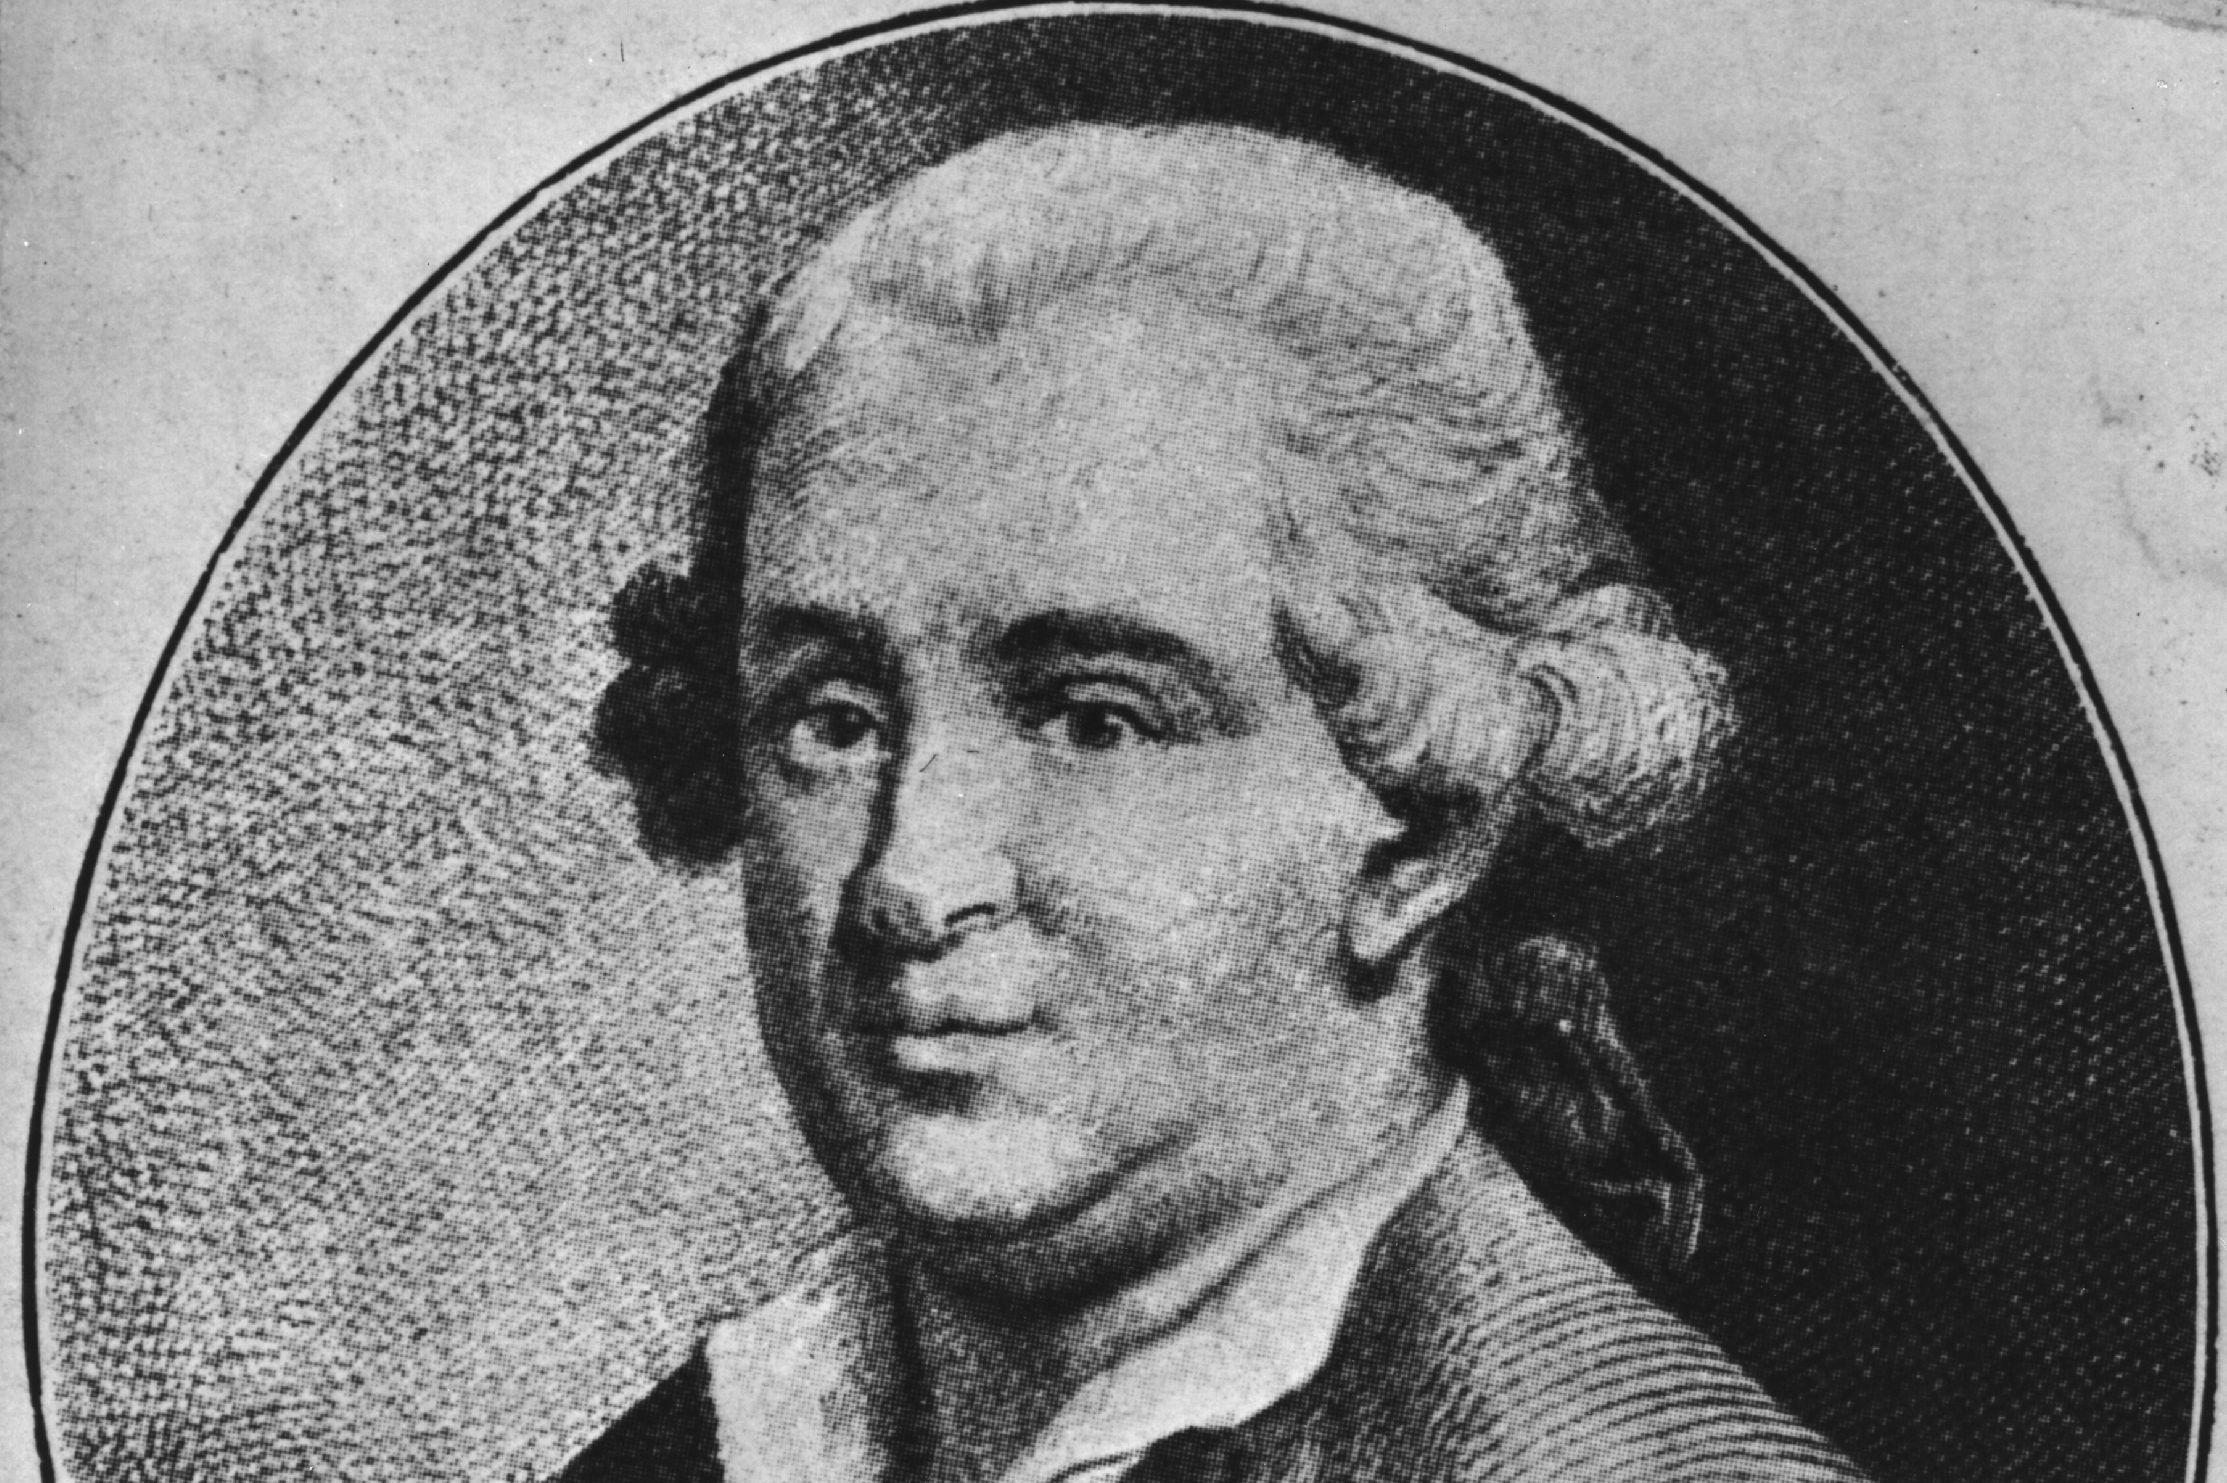 Franz Anton Mesmer, the Man Who Invented Hypnotism | Mental Floss